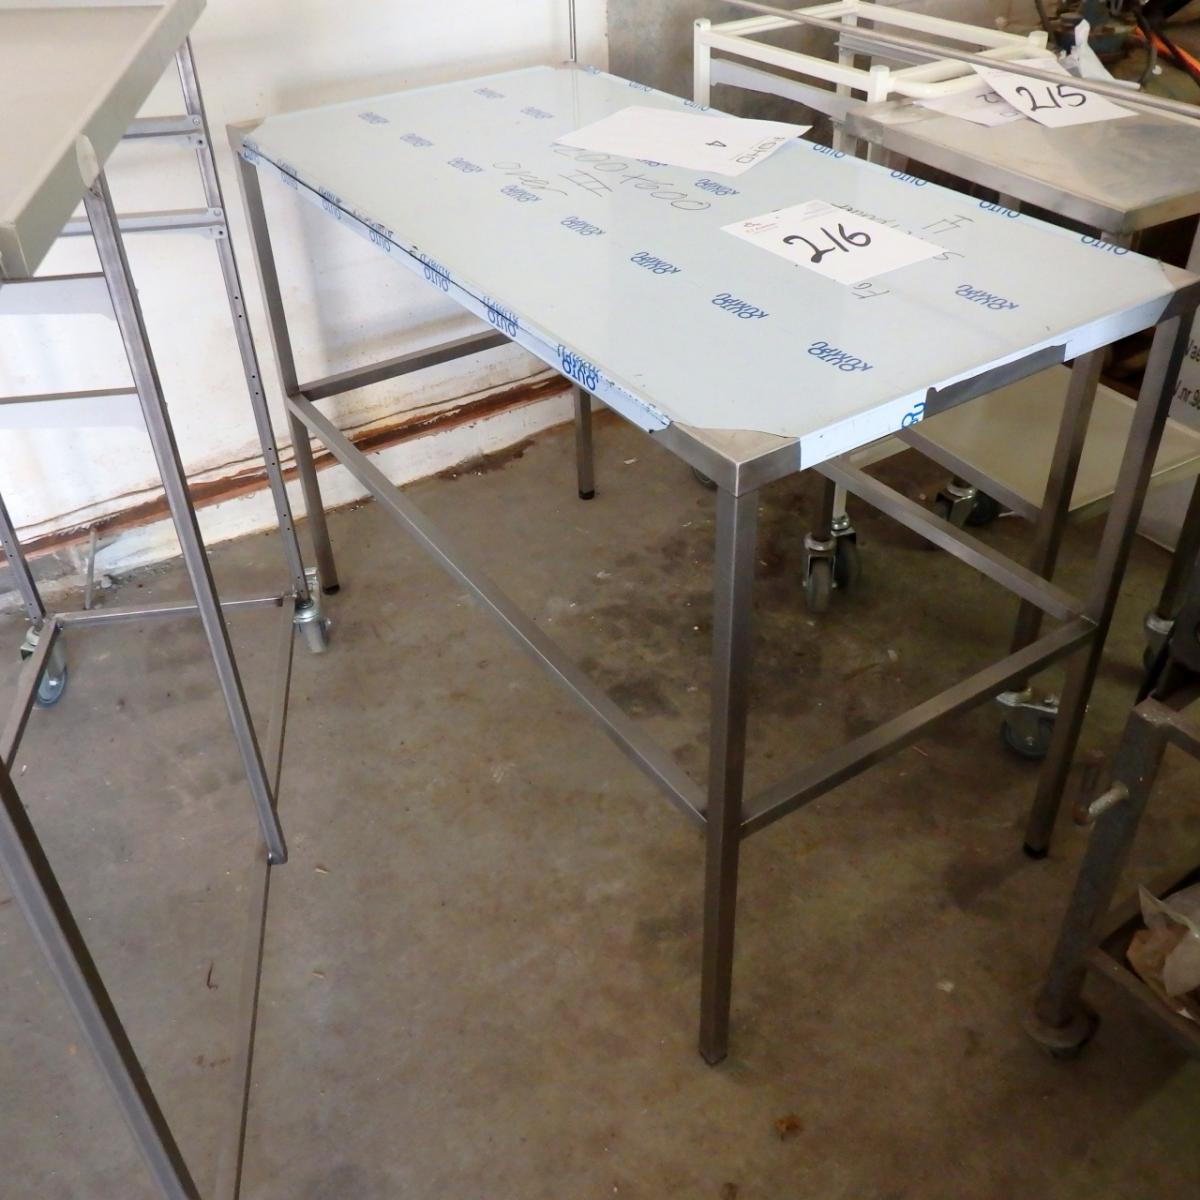 rustfri bord Rustfri bord med gallerikant 120 x 60 x 85 cm. + bord på hjul   KJ  rustfri bord